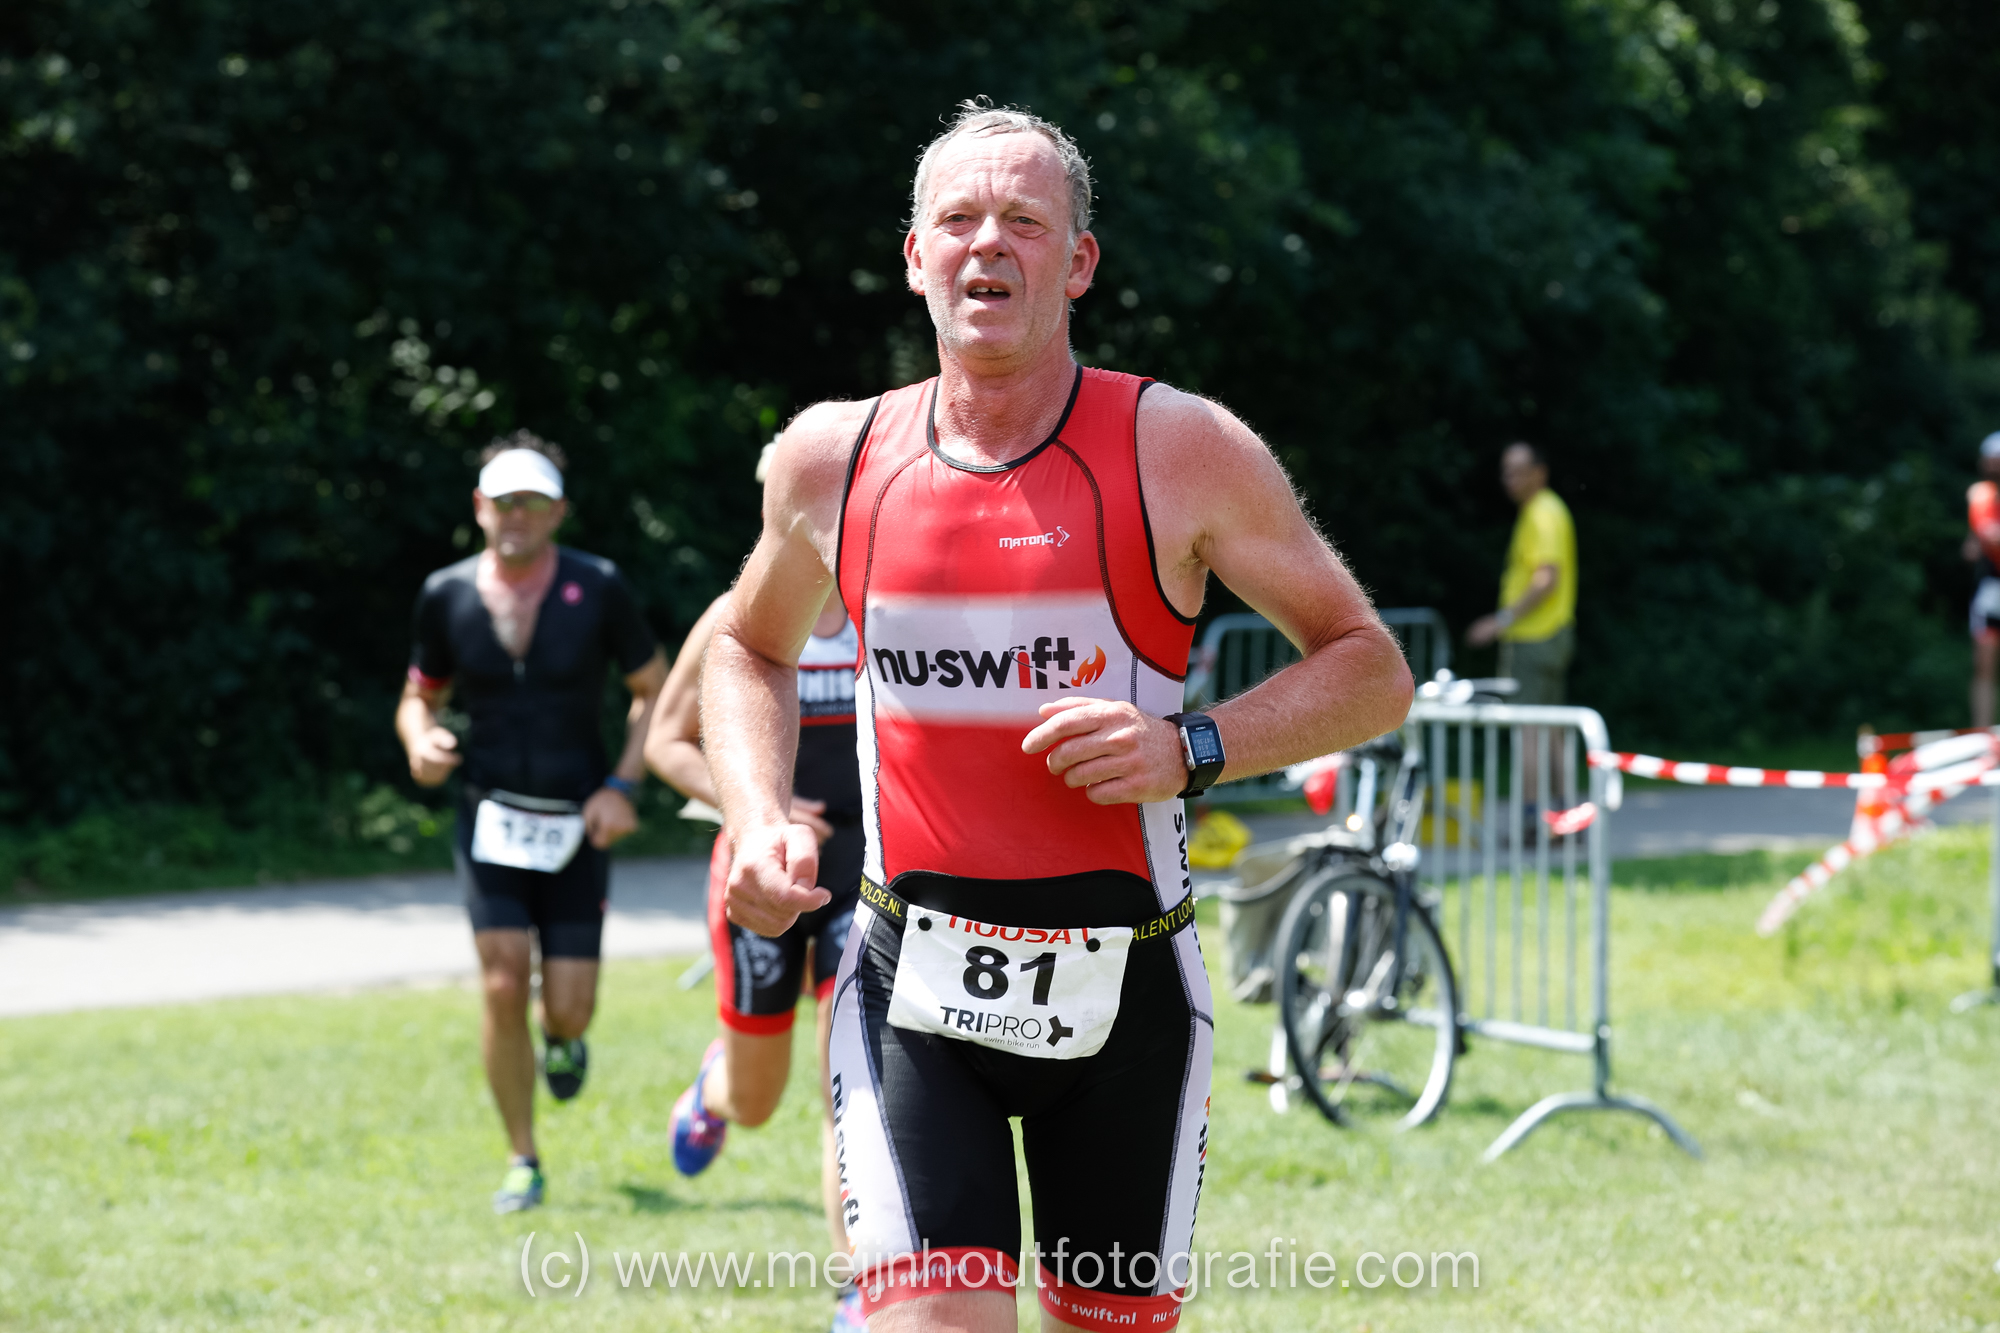 _MG_8983 Triathlon Huizen 2018 #87.jpg